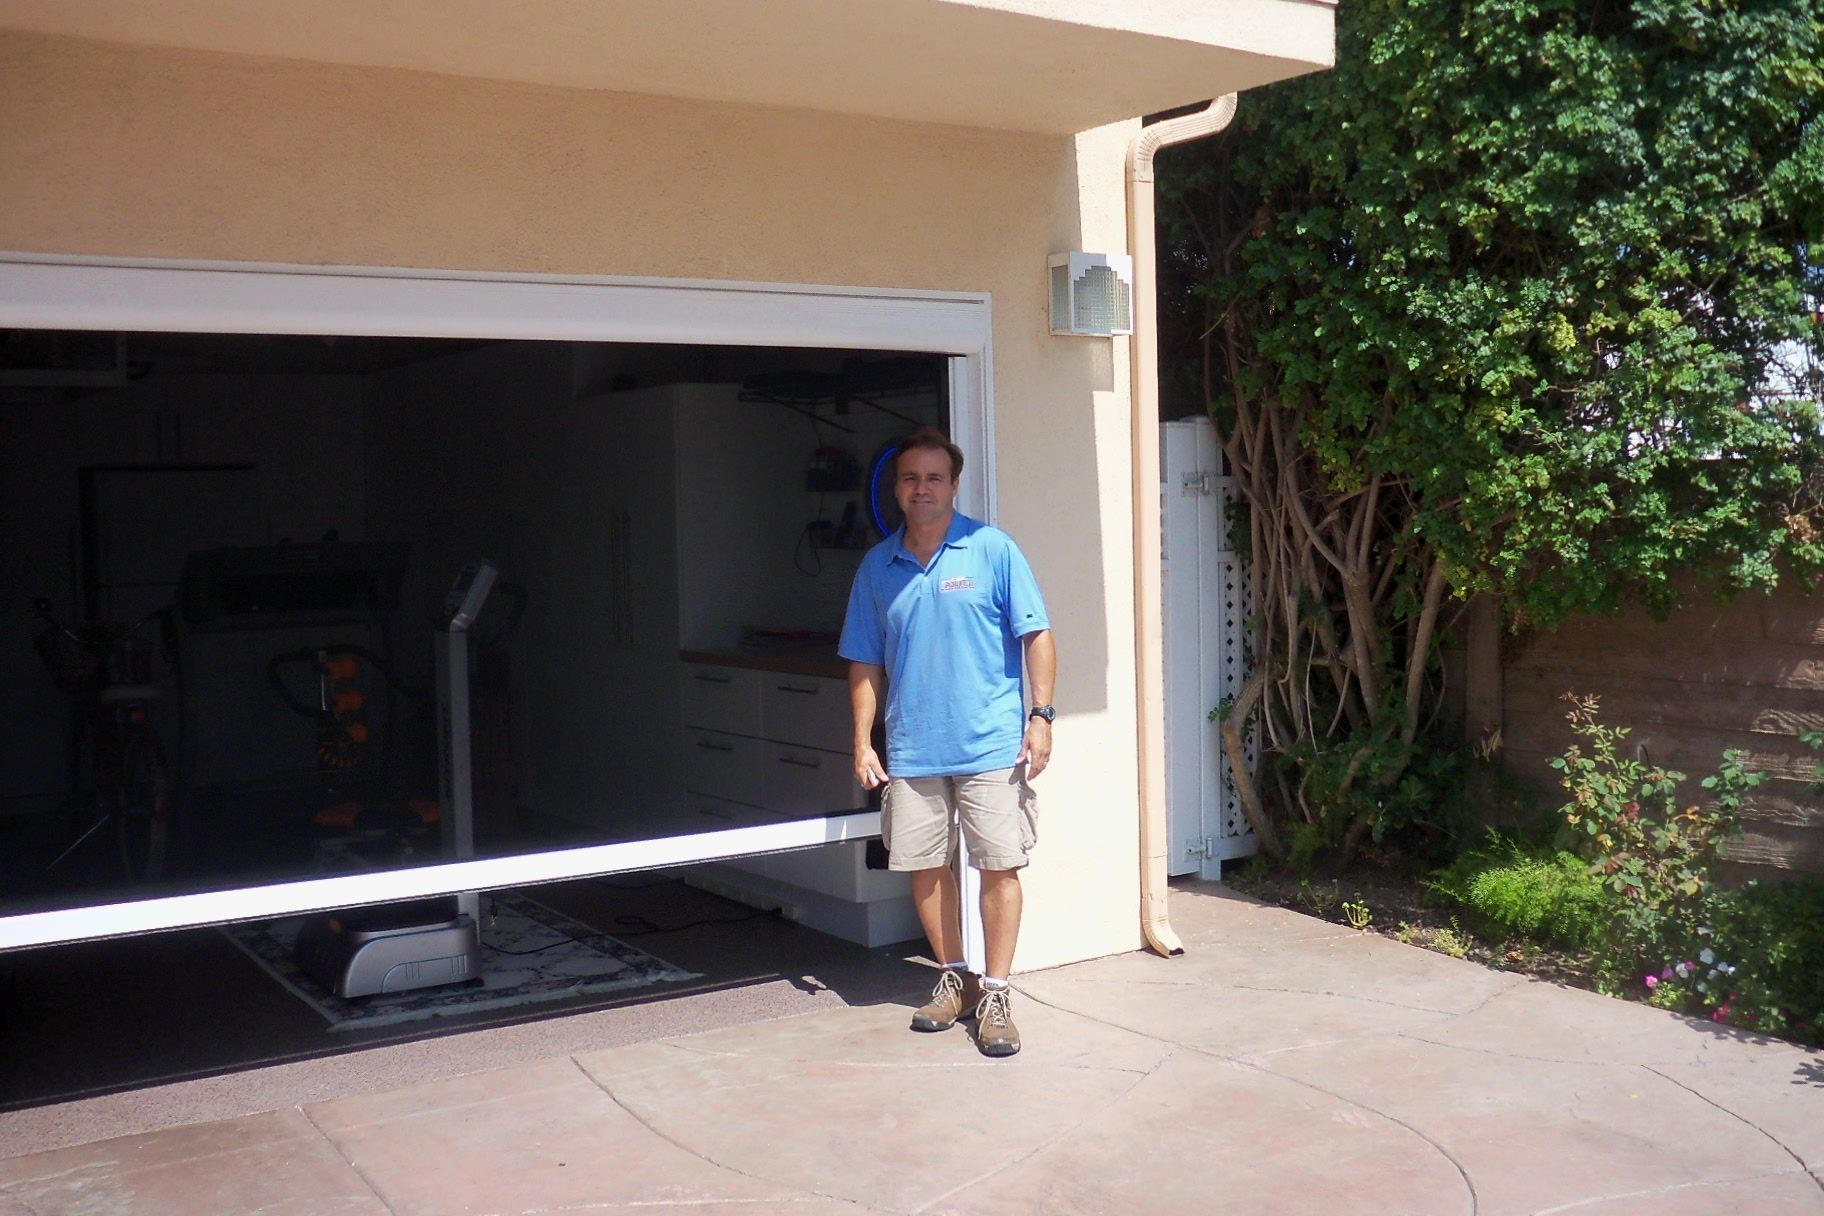 Motorized Screens For Garage Doors Httpthefallguyediting